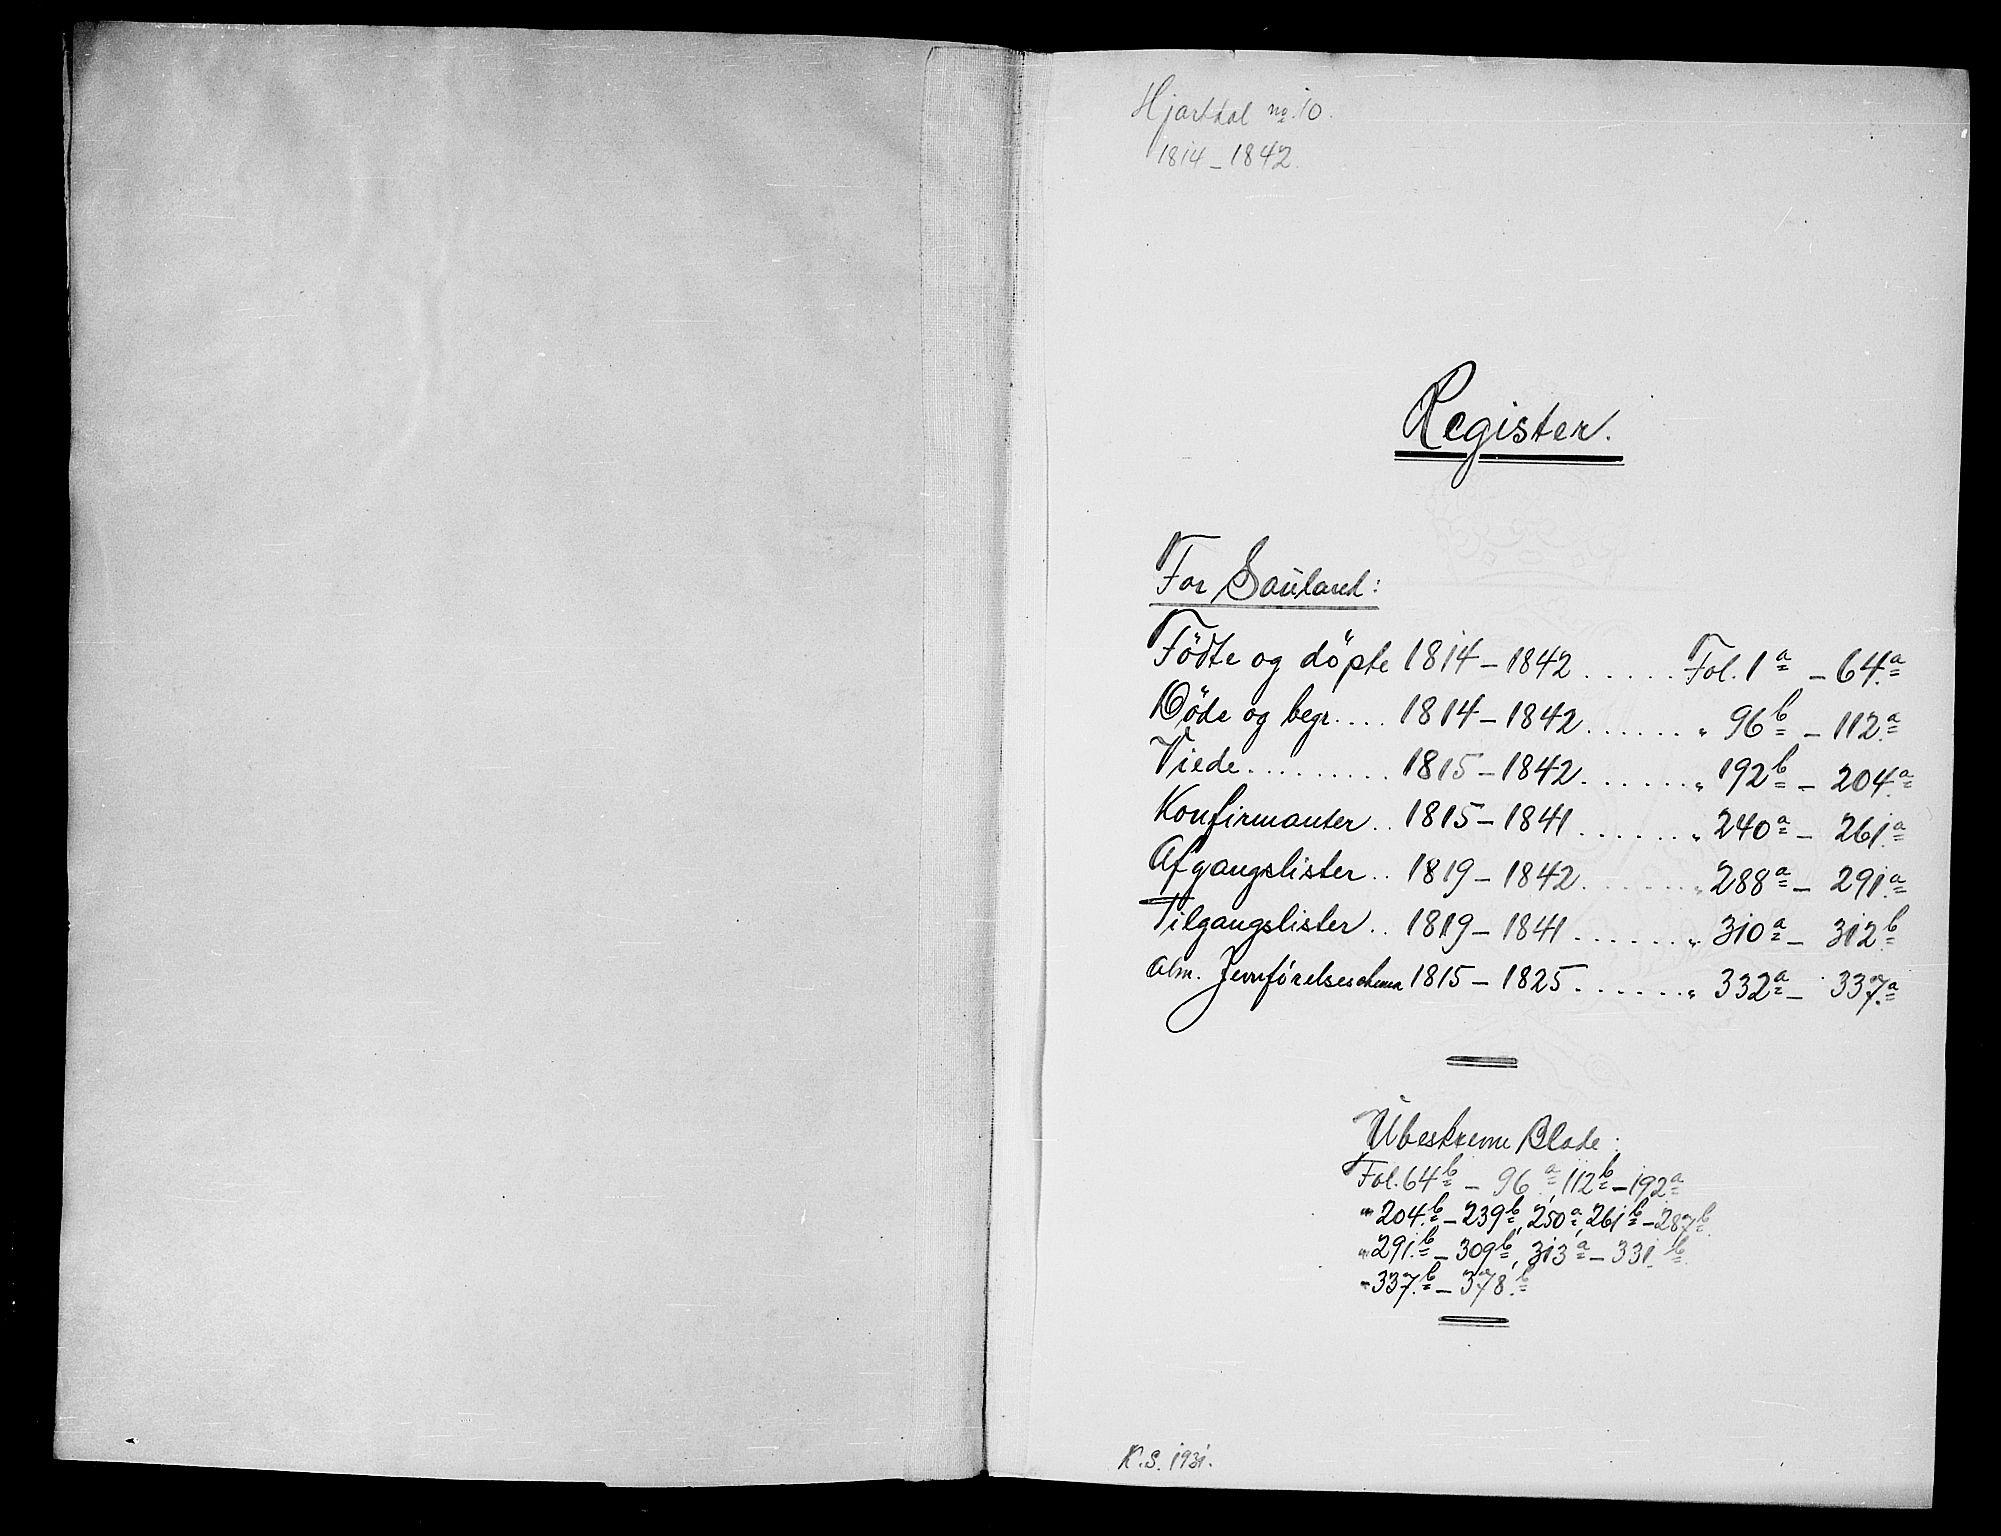 SAKO, Hjartdal kirkebøker, G/Gb/L0001: Klokkerbok nr. II 1, 1815-1842